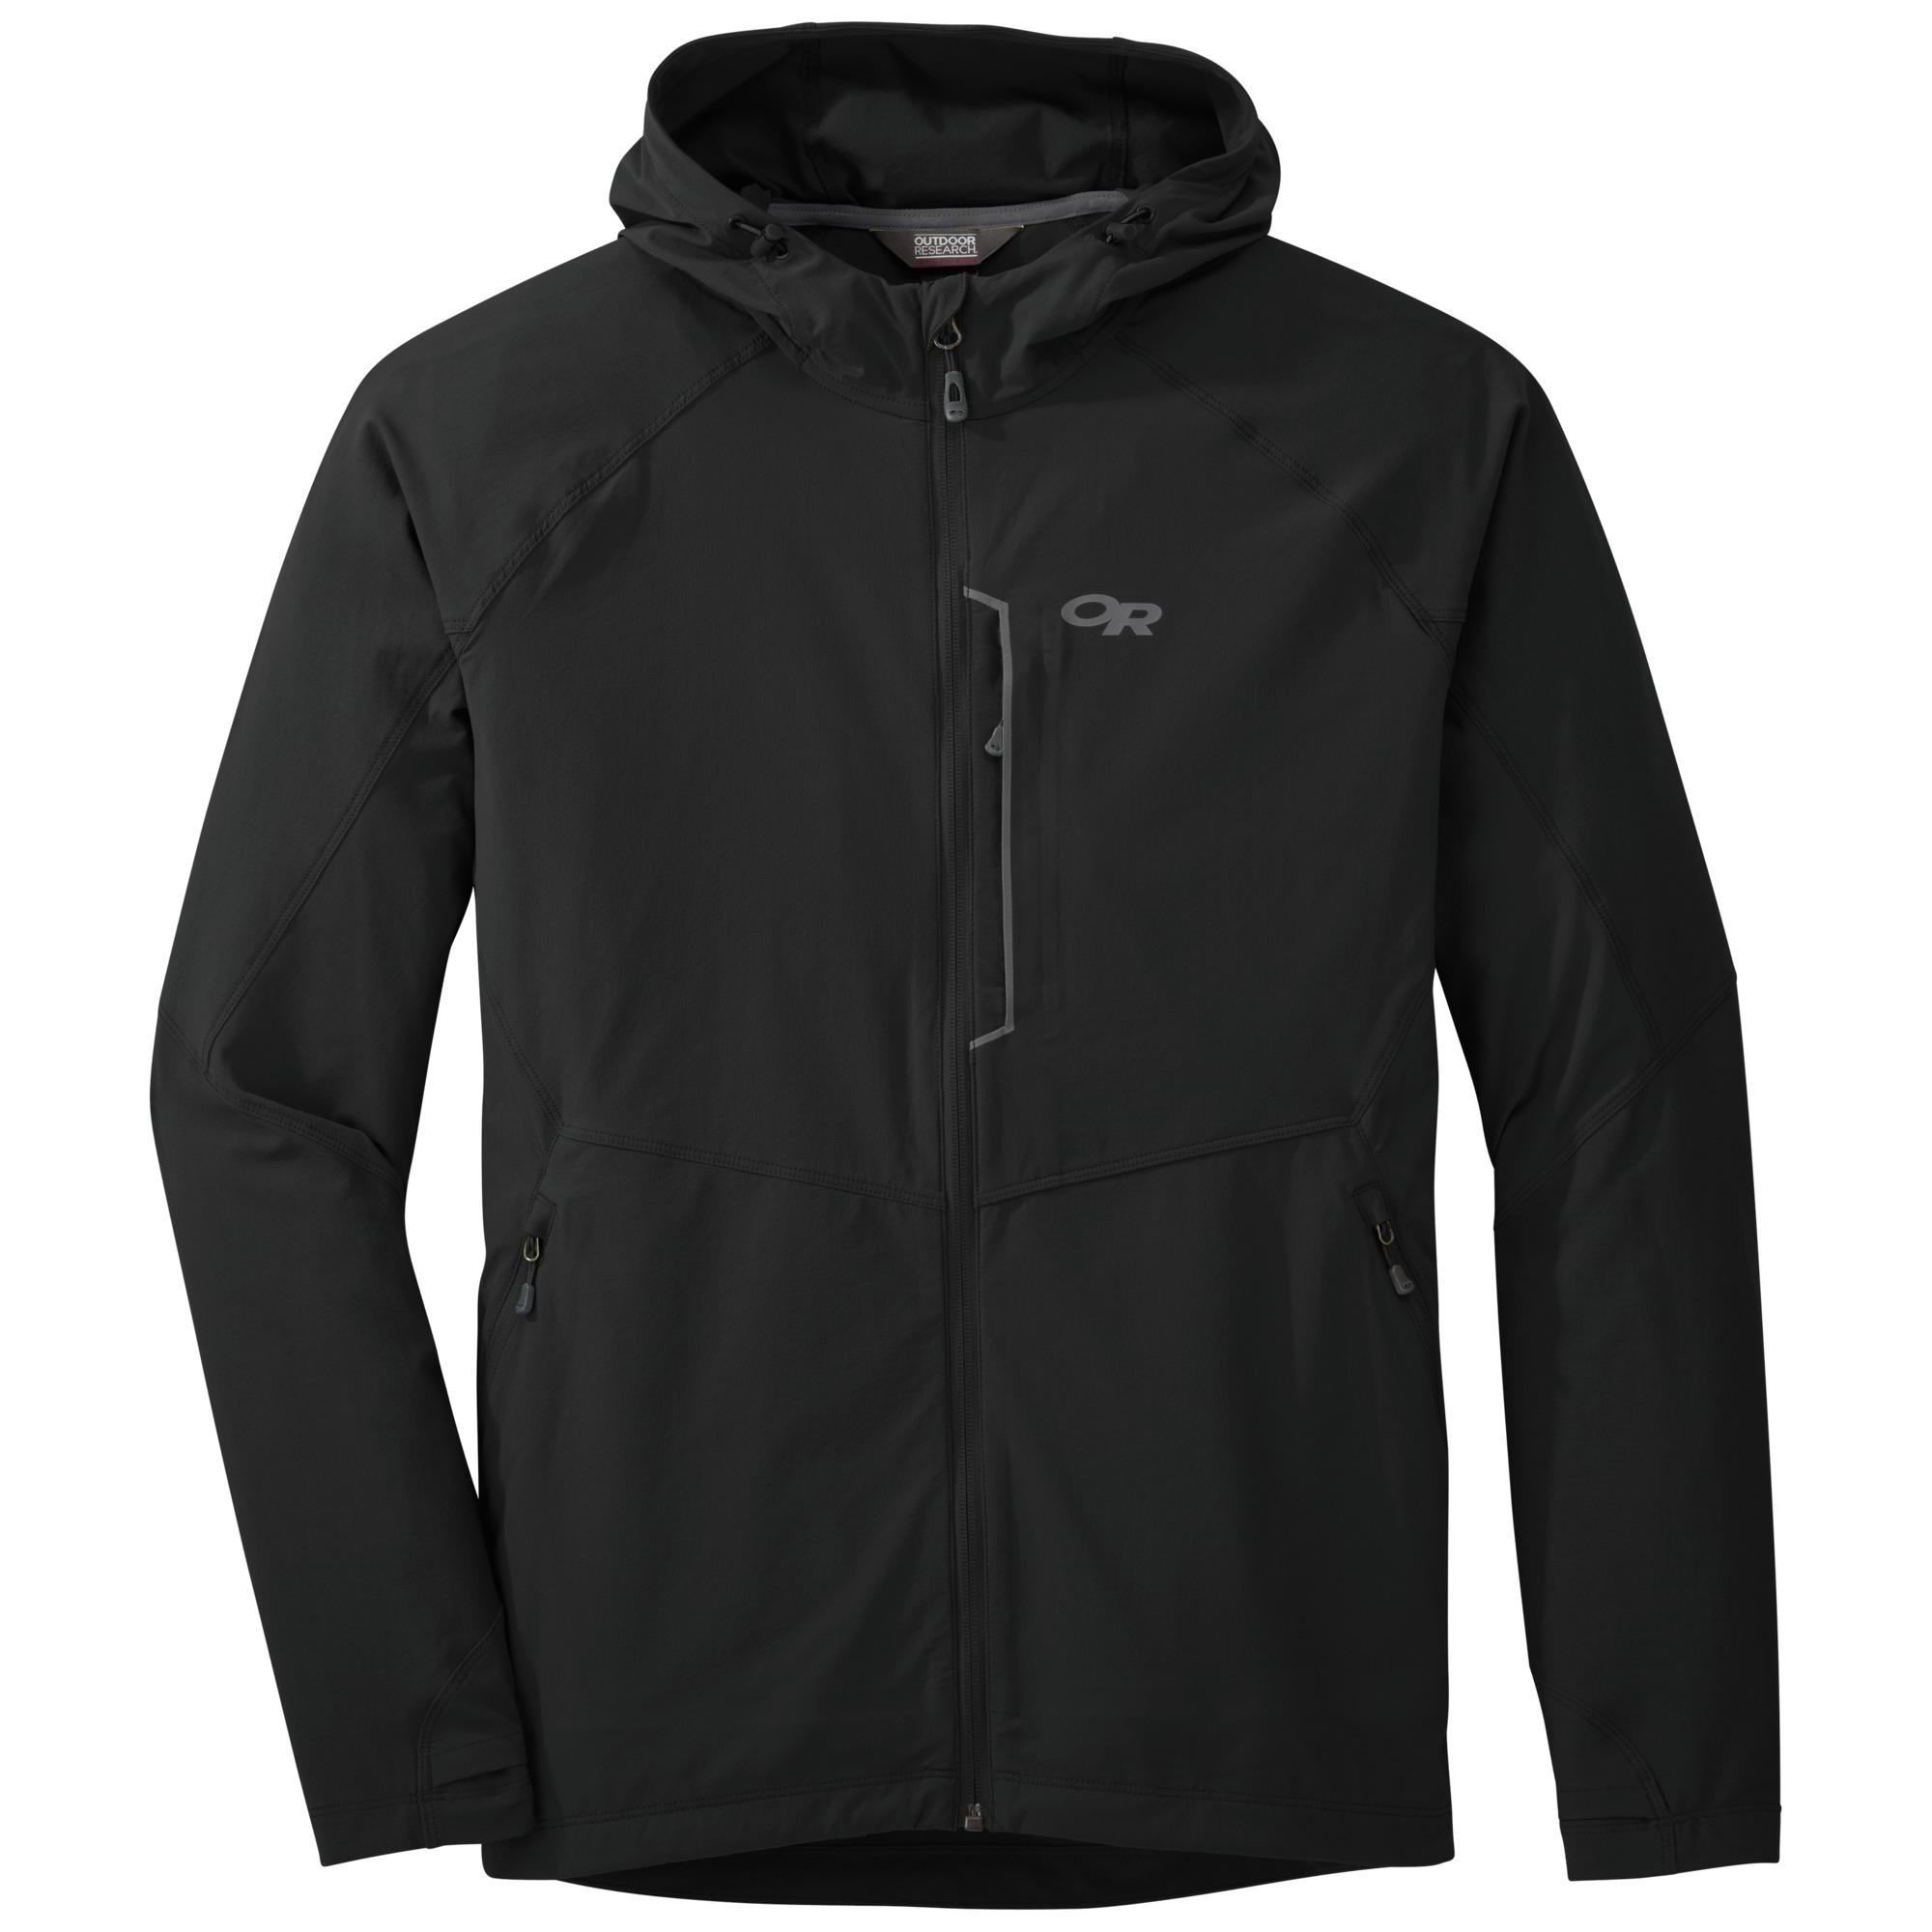 Outdoor Research Men's Ferrosi Hooded Jacket-black-M - Gr. M